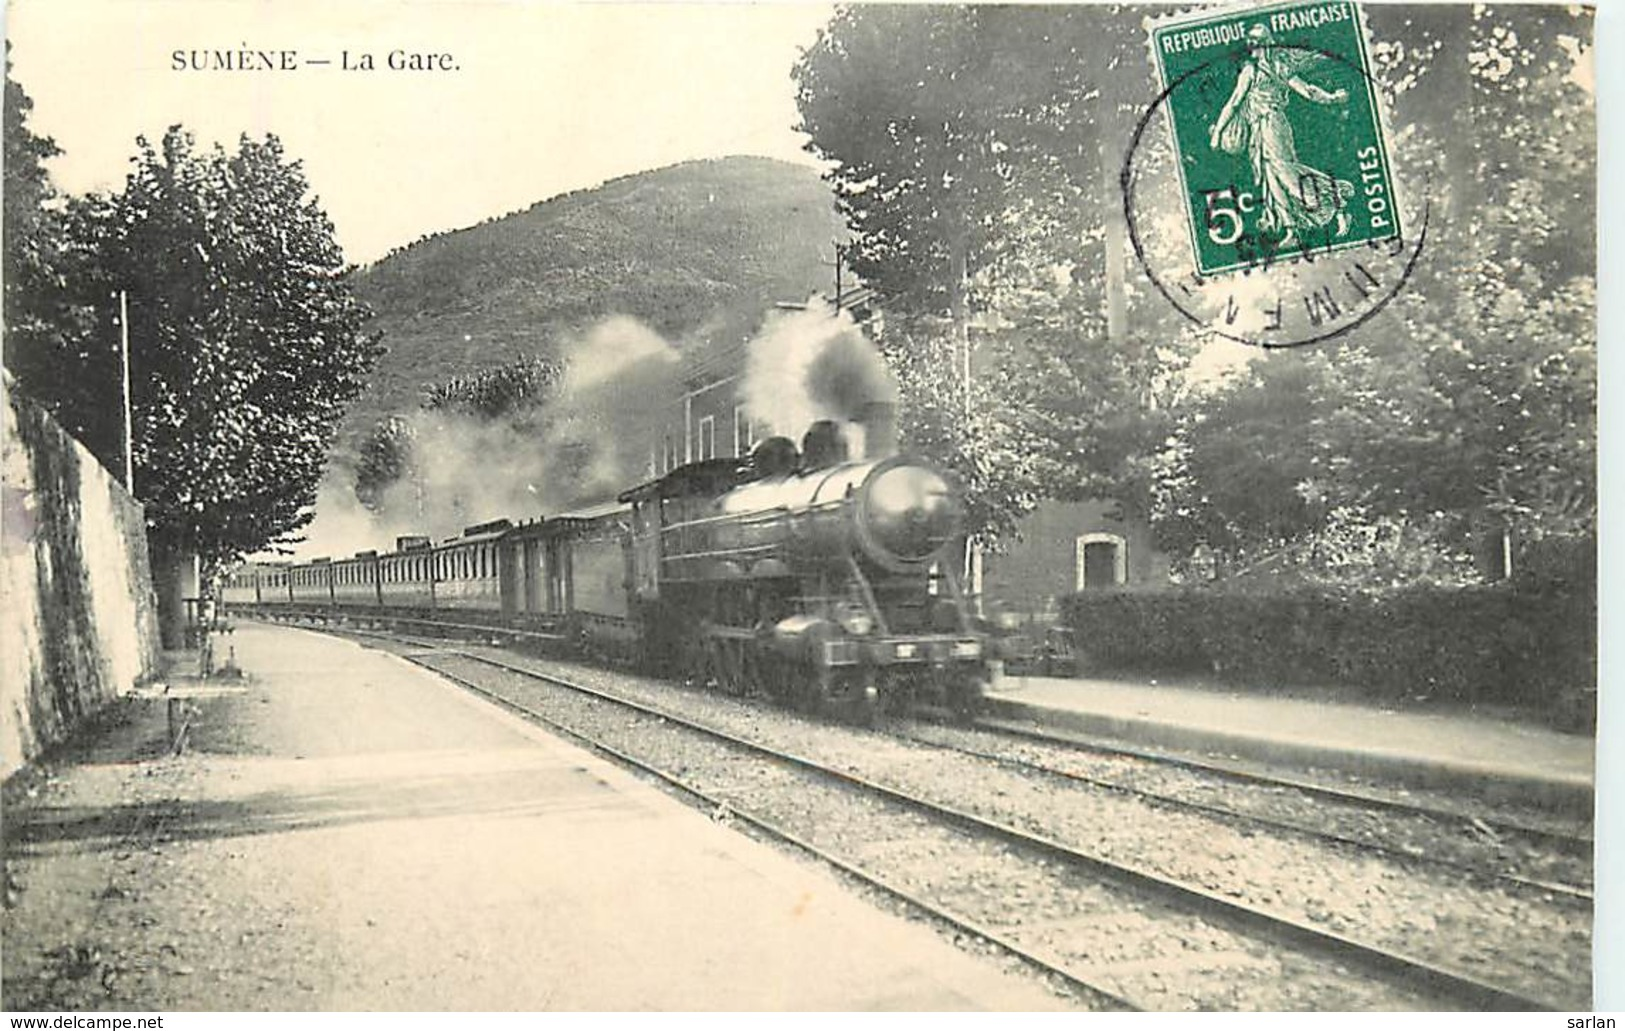 30 , SUMENE , La Gare , * 432 07 - France